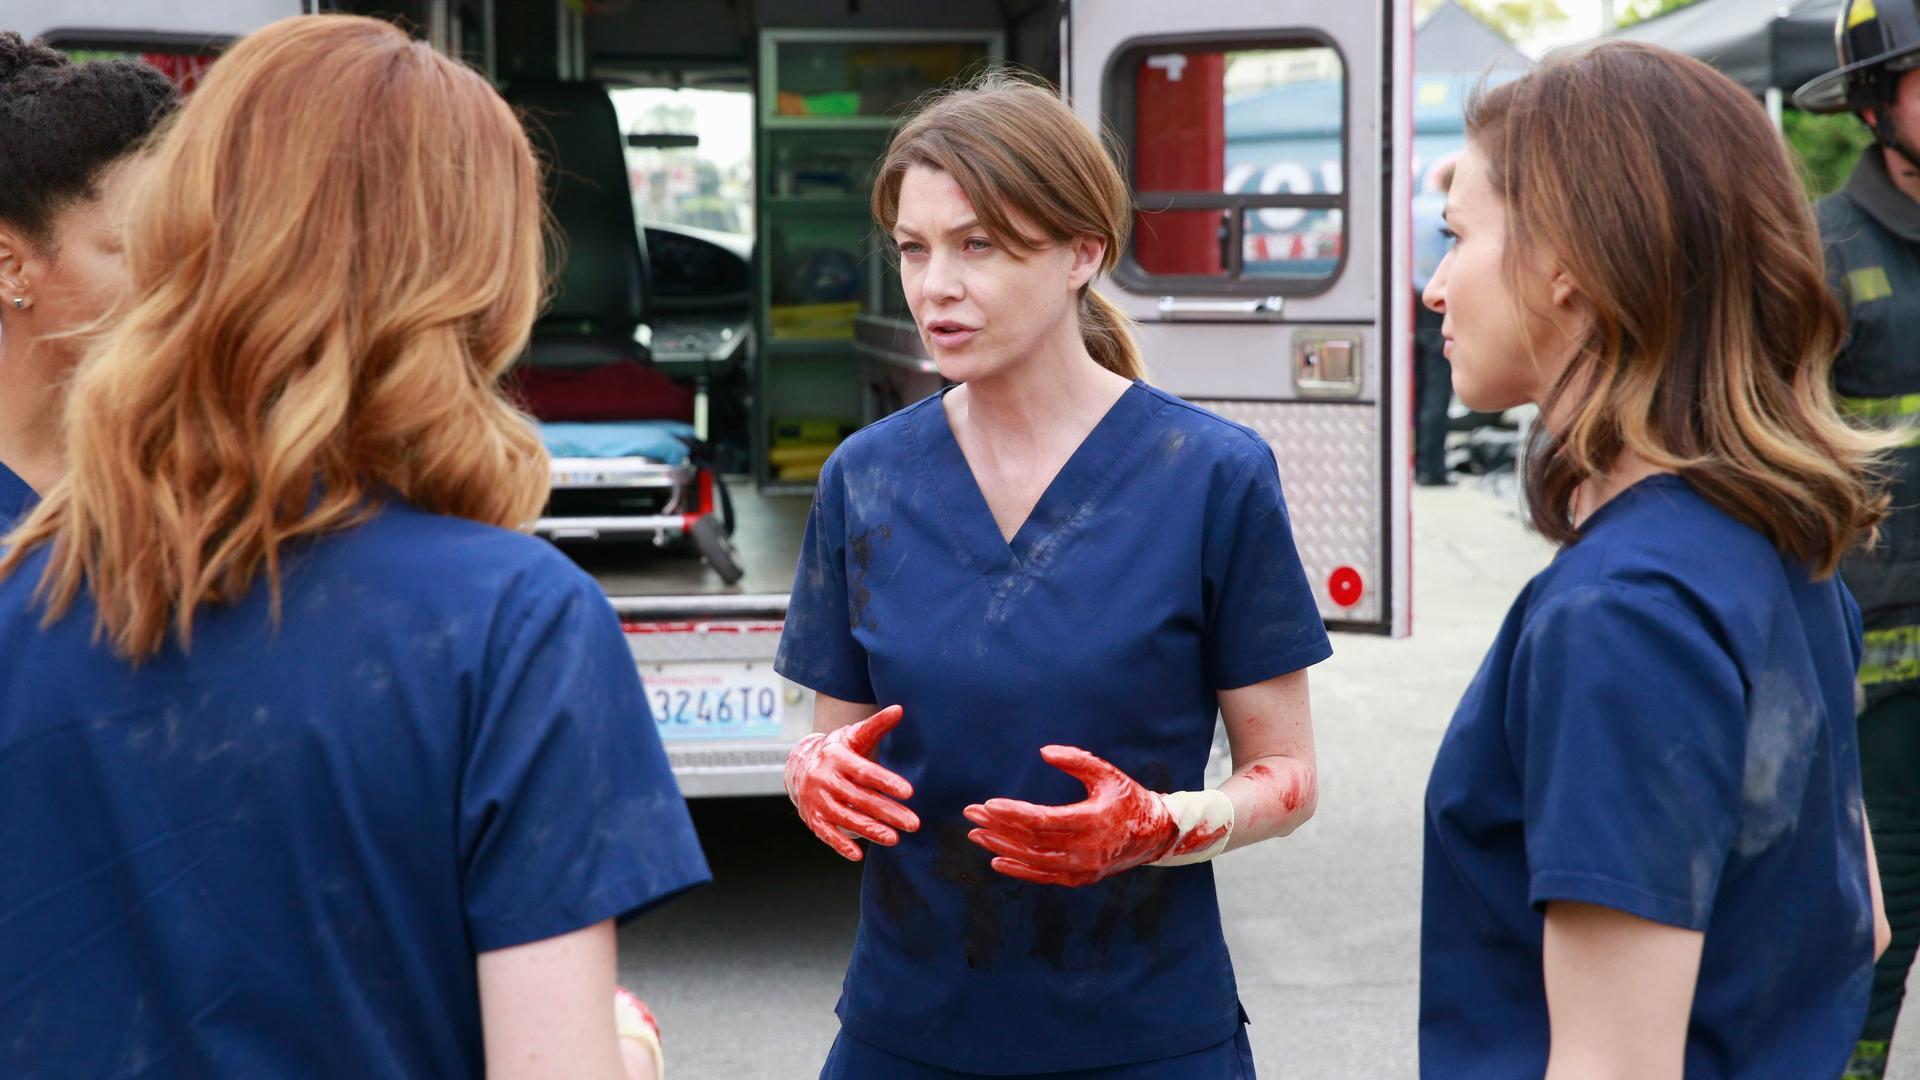 Time Stops Summary - Greys Anatomy Season 11, Episode 23 Episode Guide